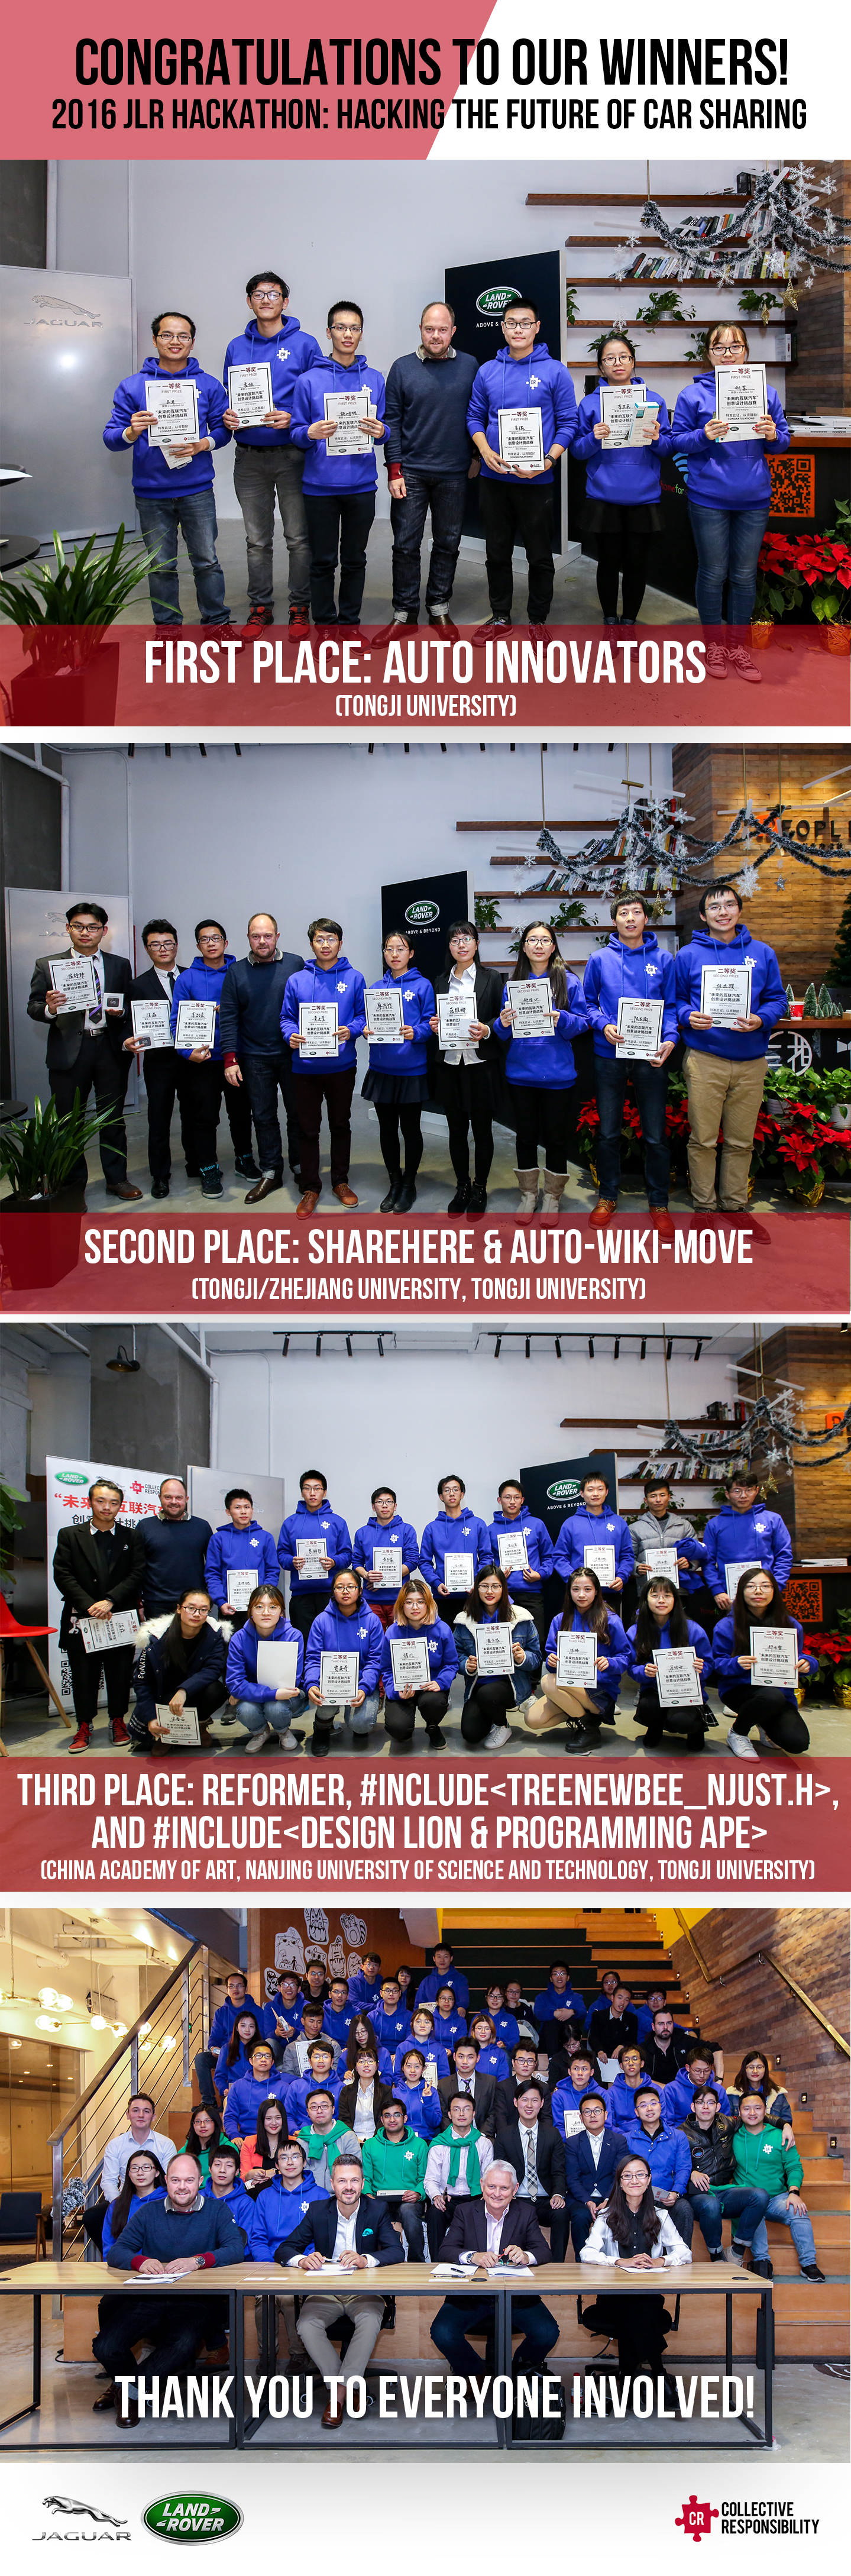 JLR Congratulations Banner Hackathon Car Sharing - Collective Responsibility